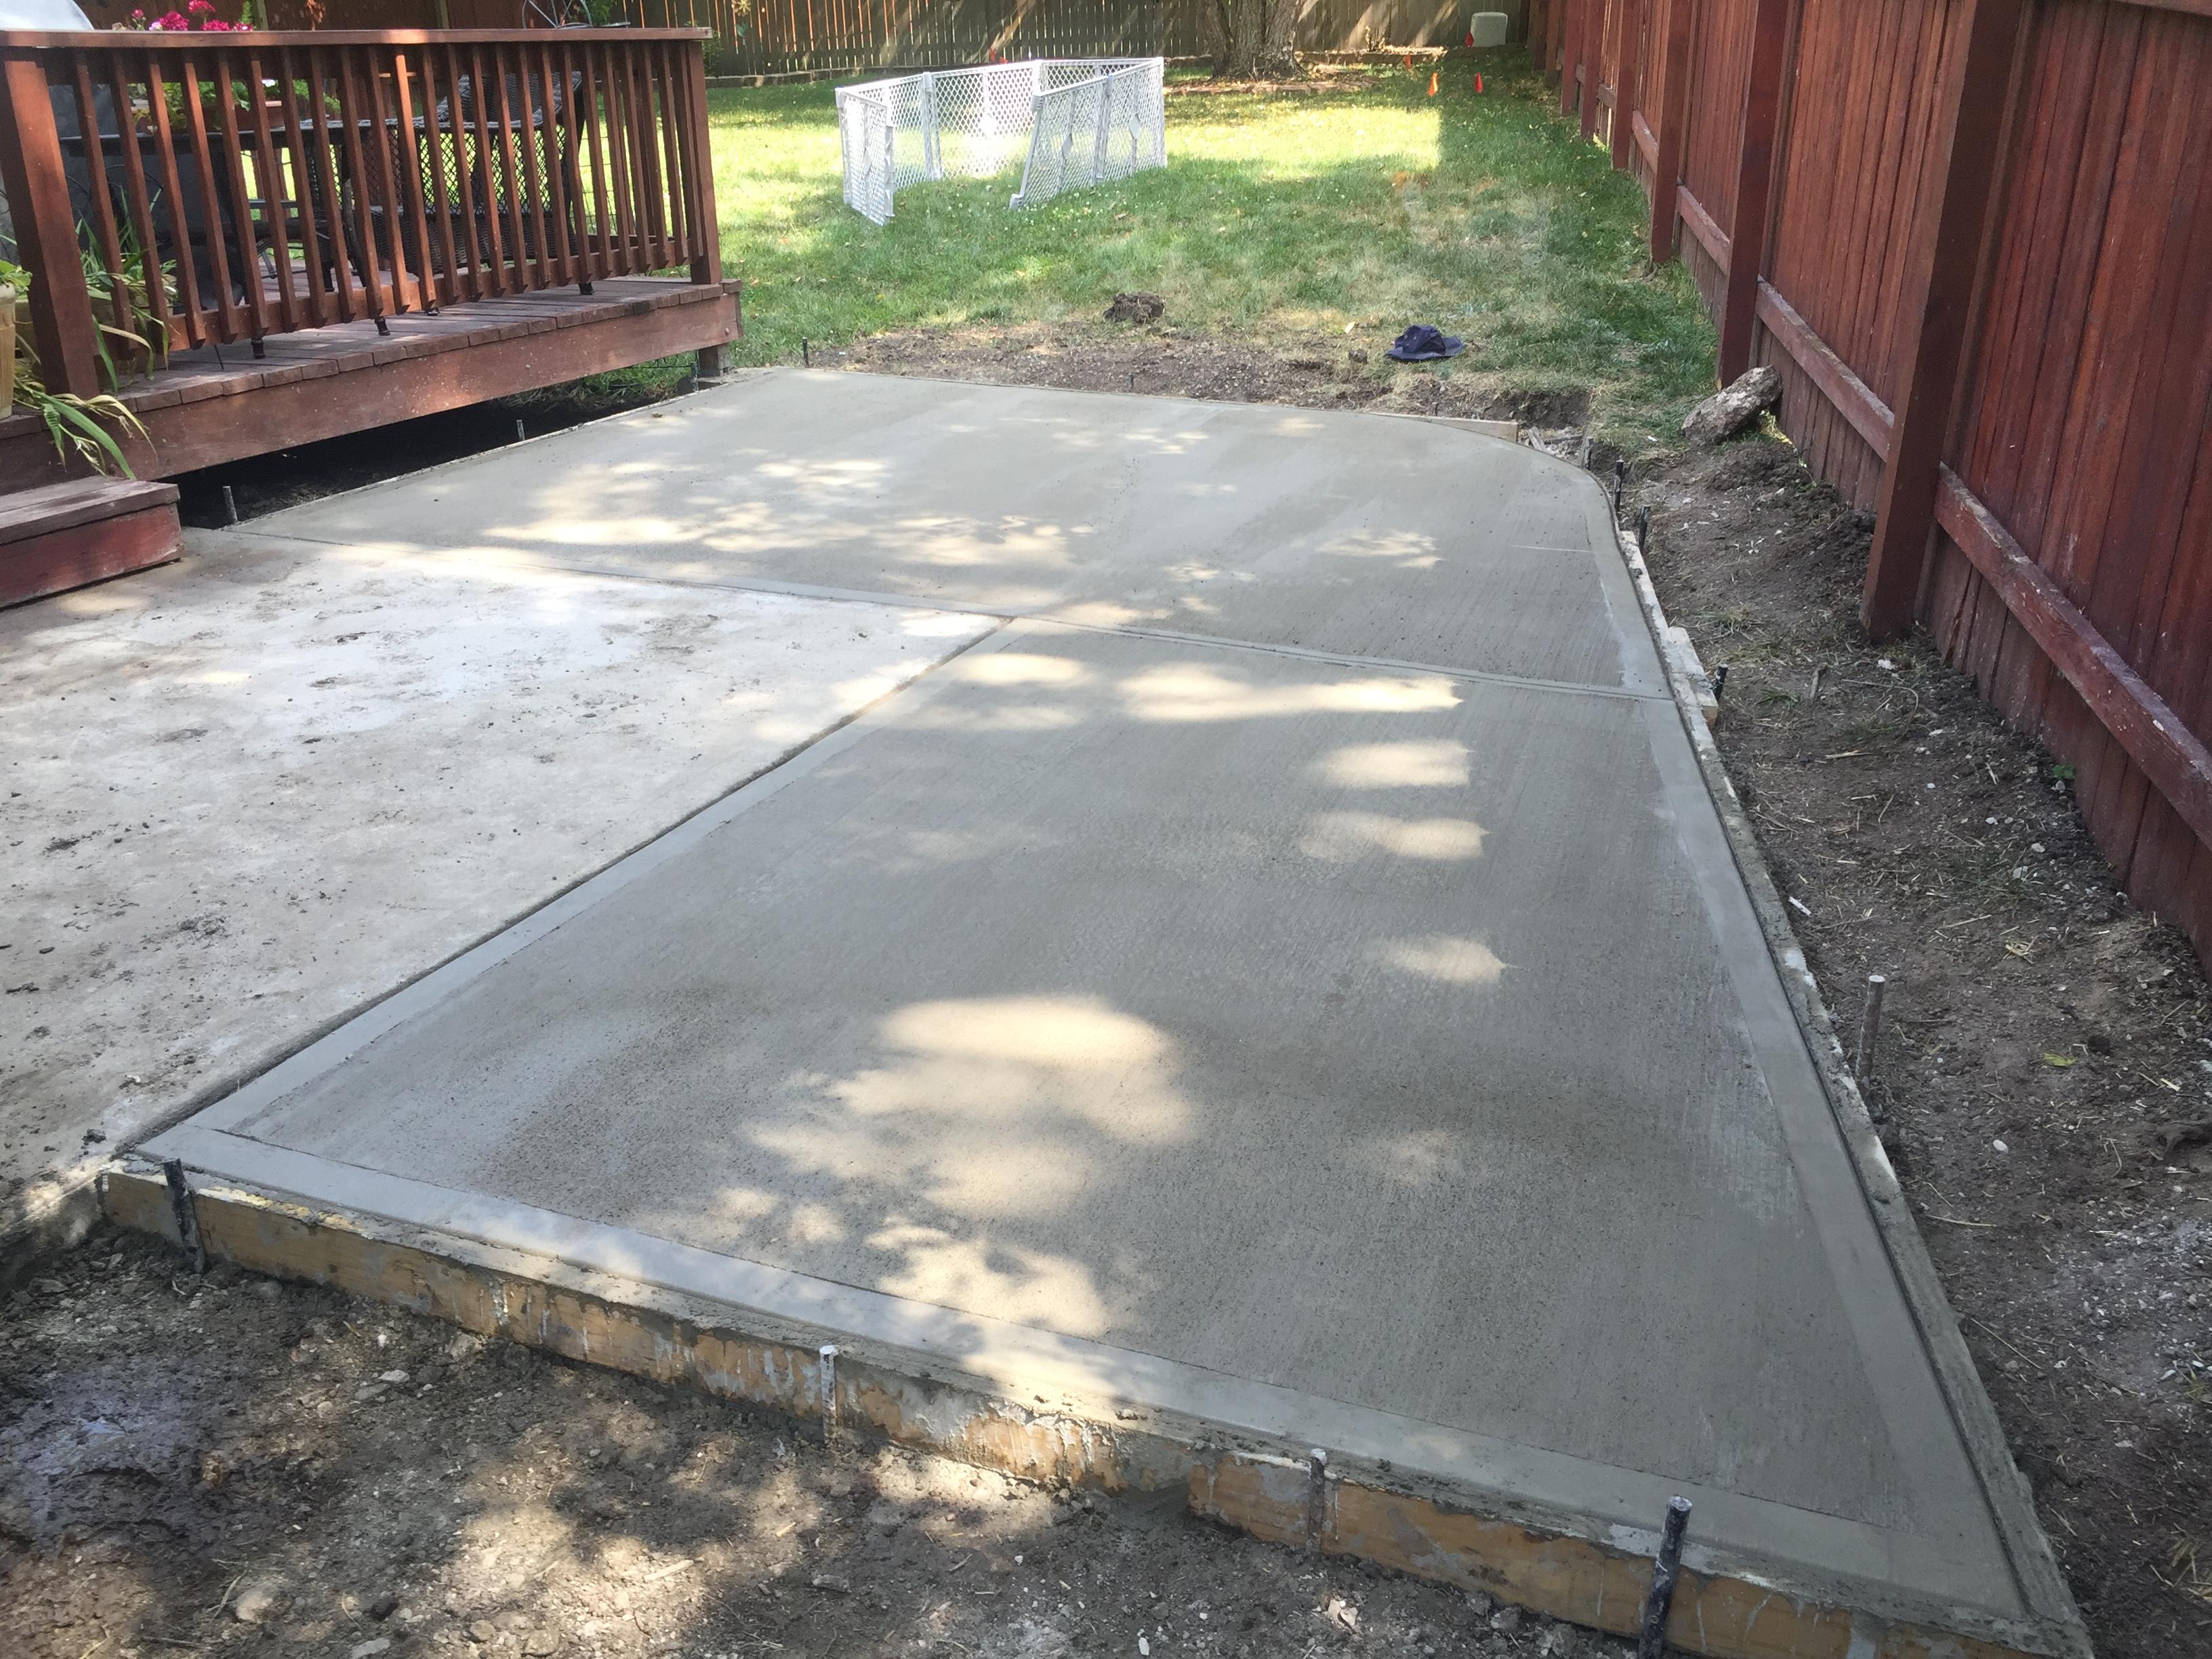 htl u2013 concrete u2013 backyard patio enlargement 3 u2013 hometown lawn llc